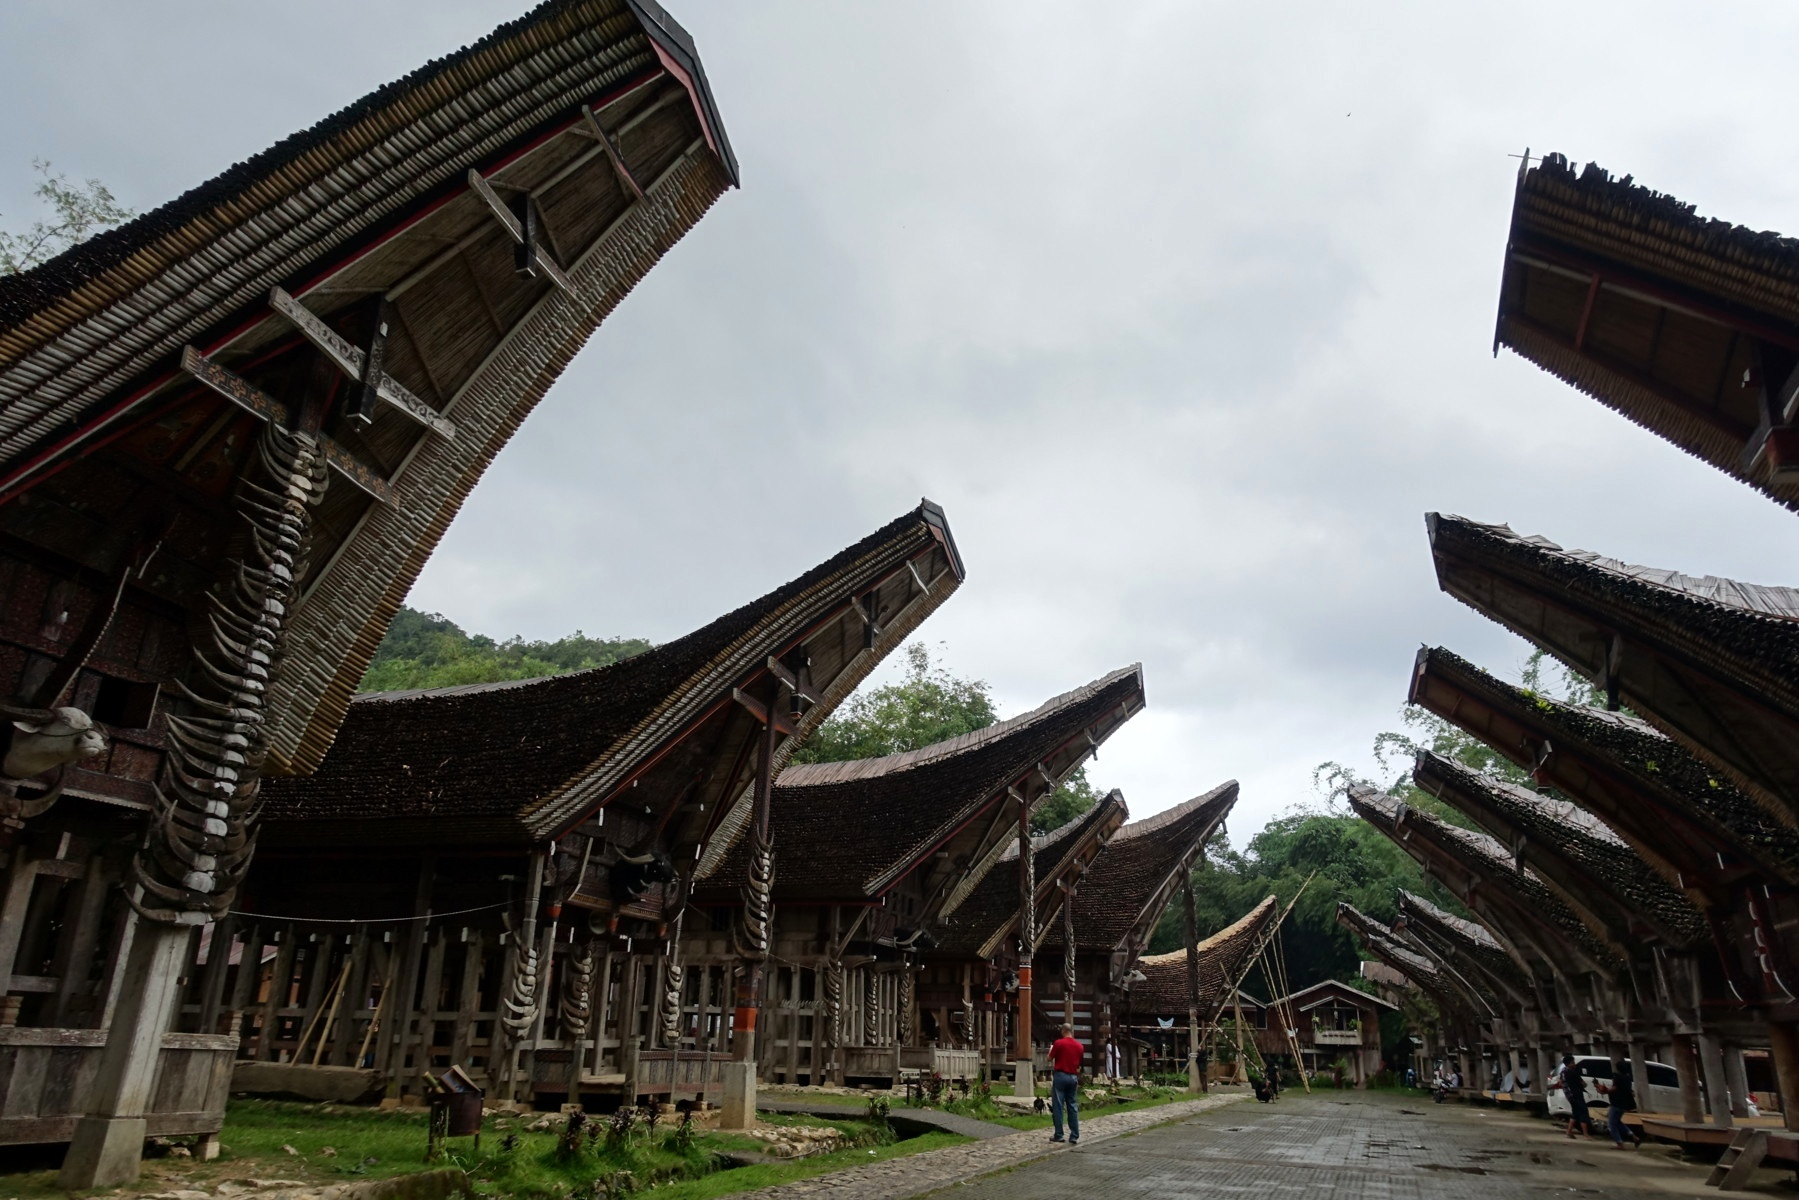 Indonesie_Sulawesi_Toraja_Rantepao DSC05165